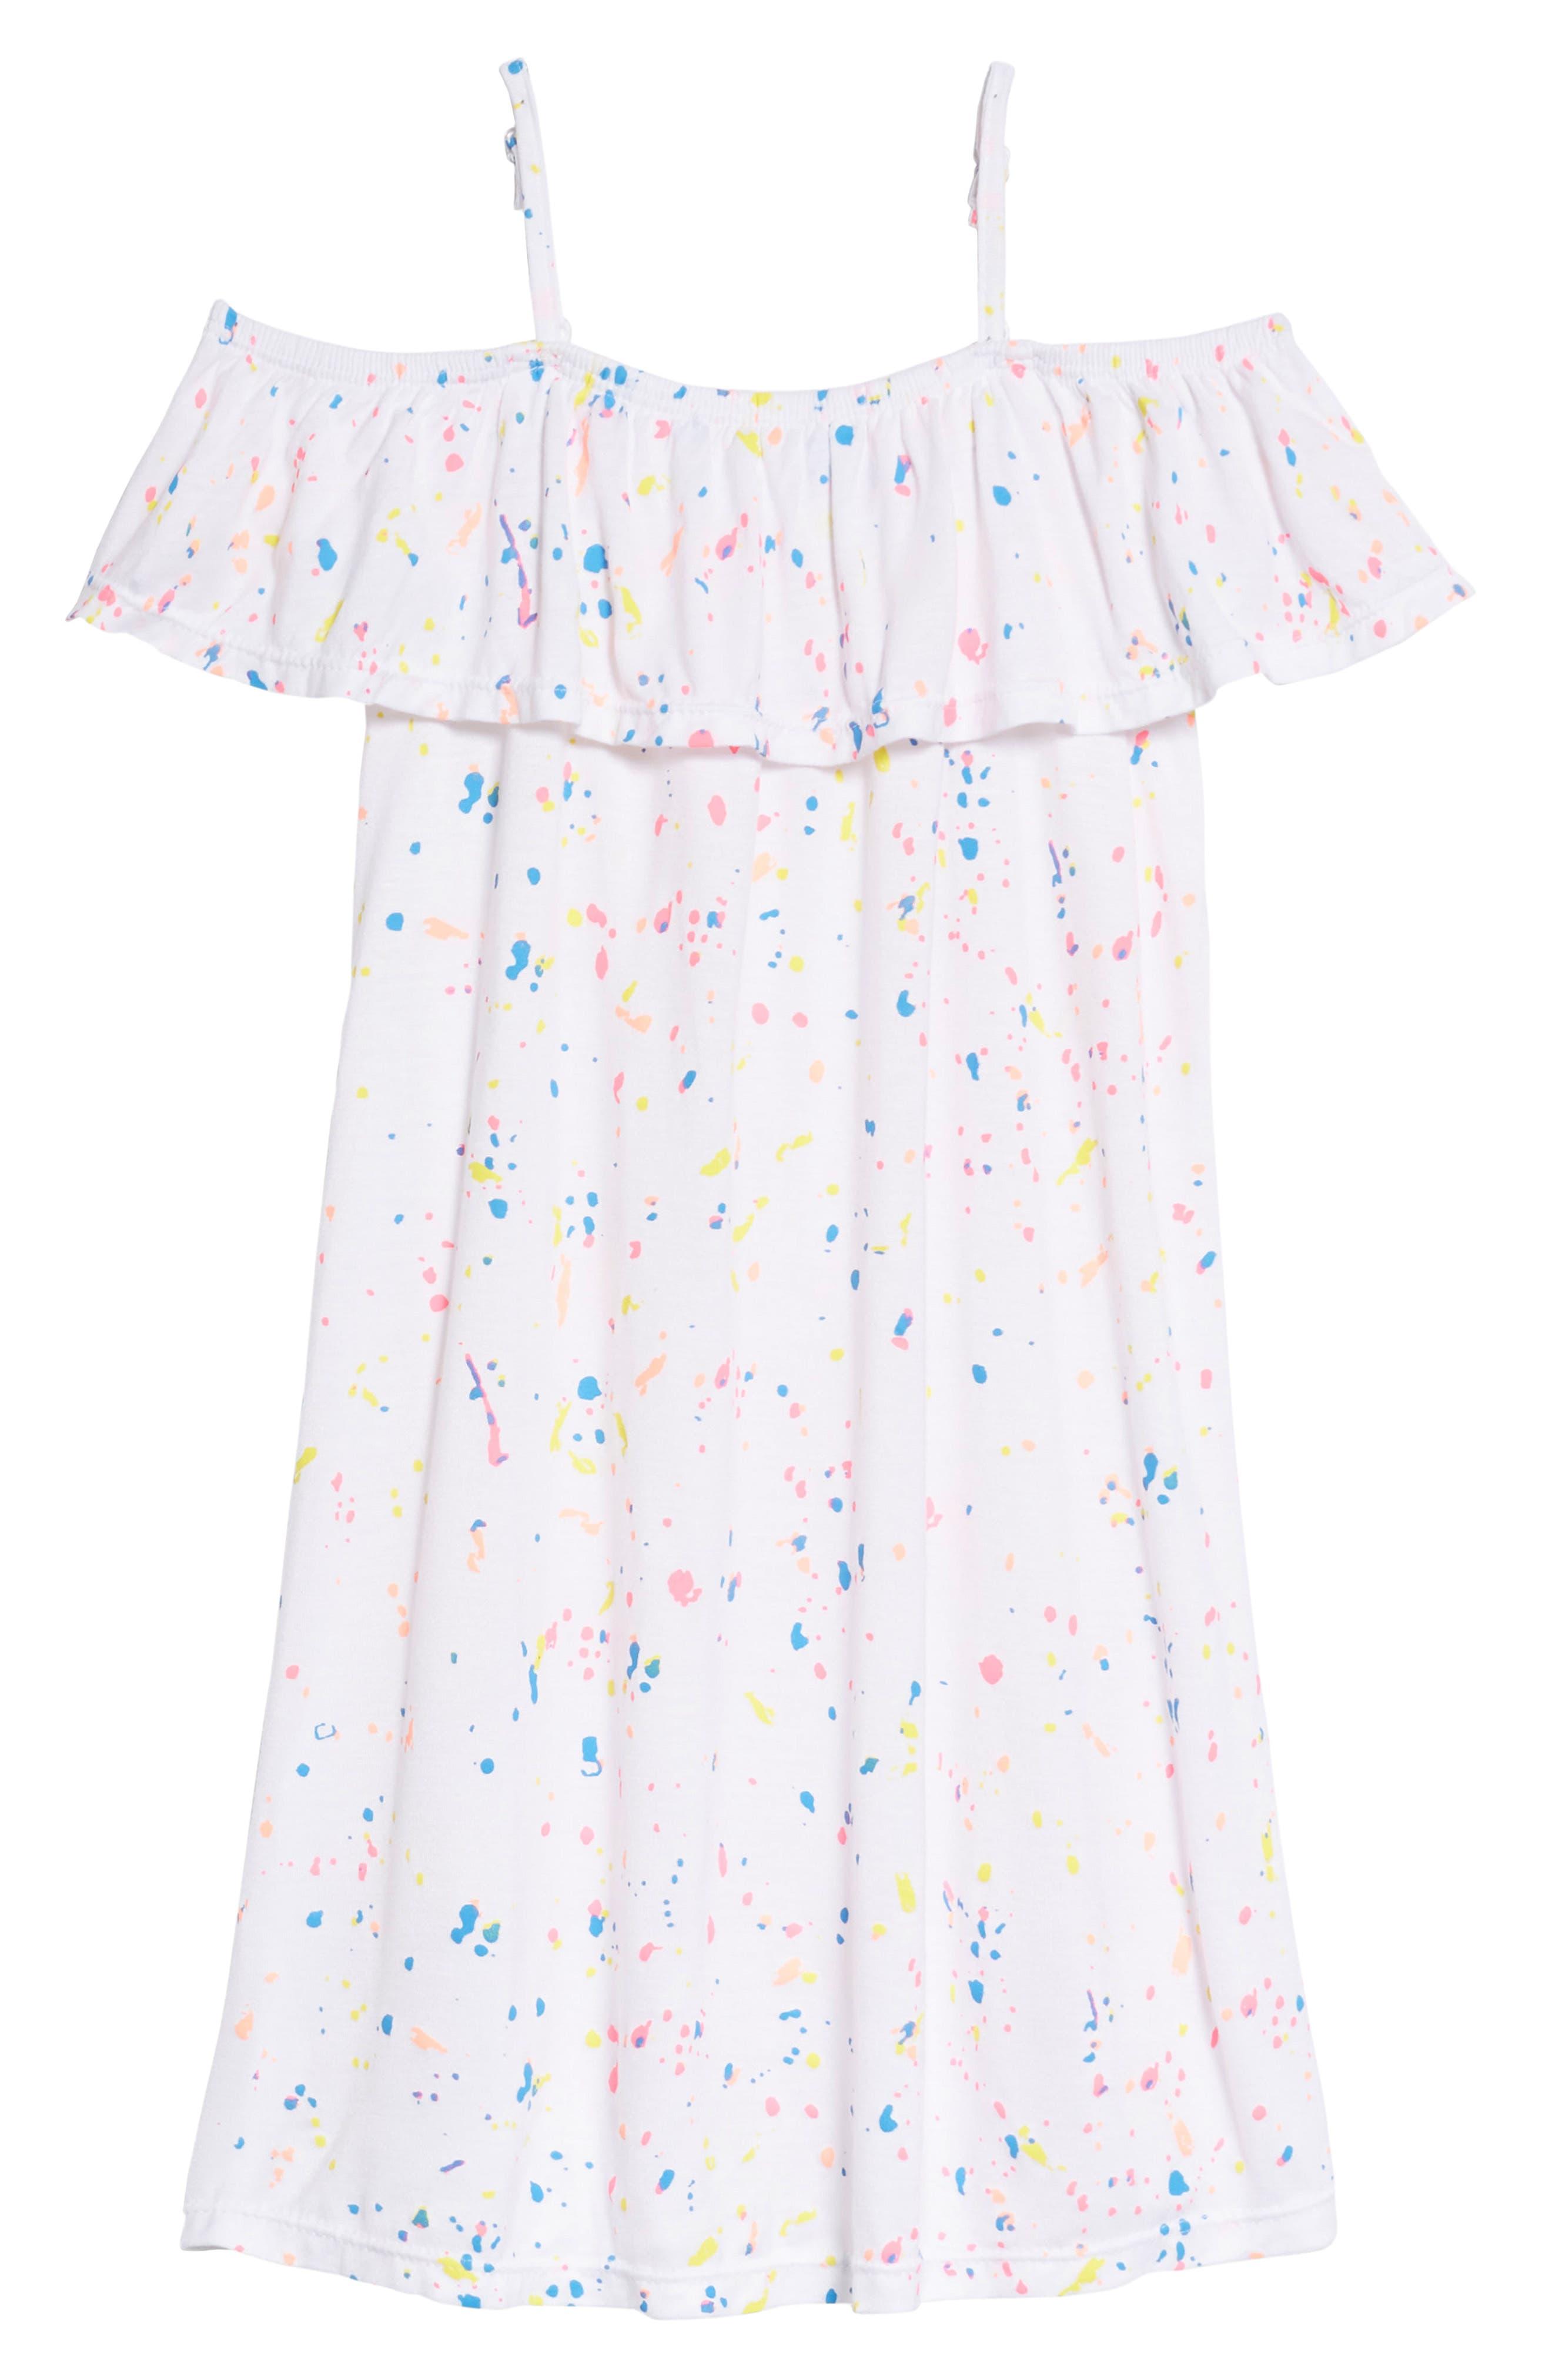 Splatter Dress,                             Main thumbnail 1, color,                             100